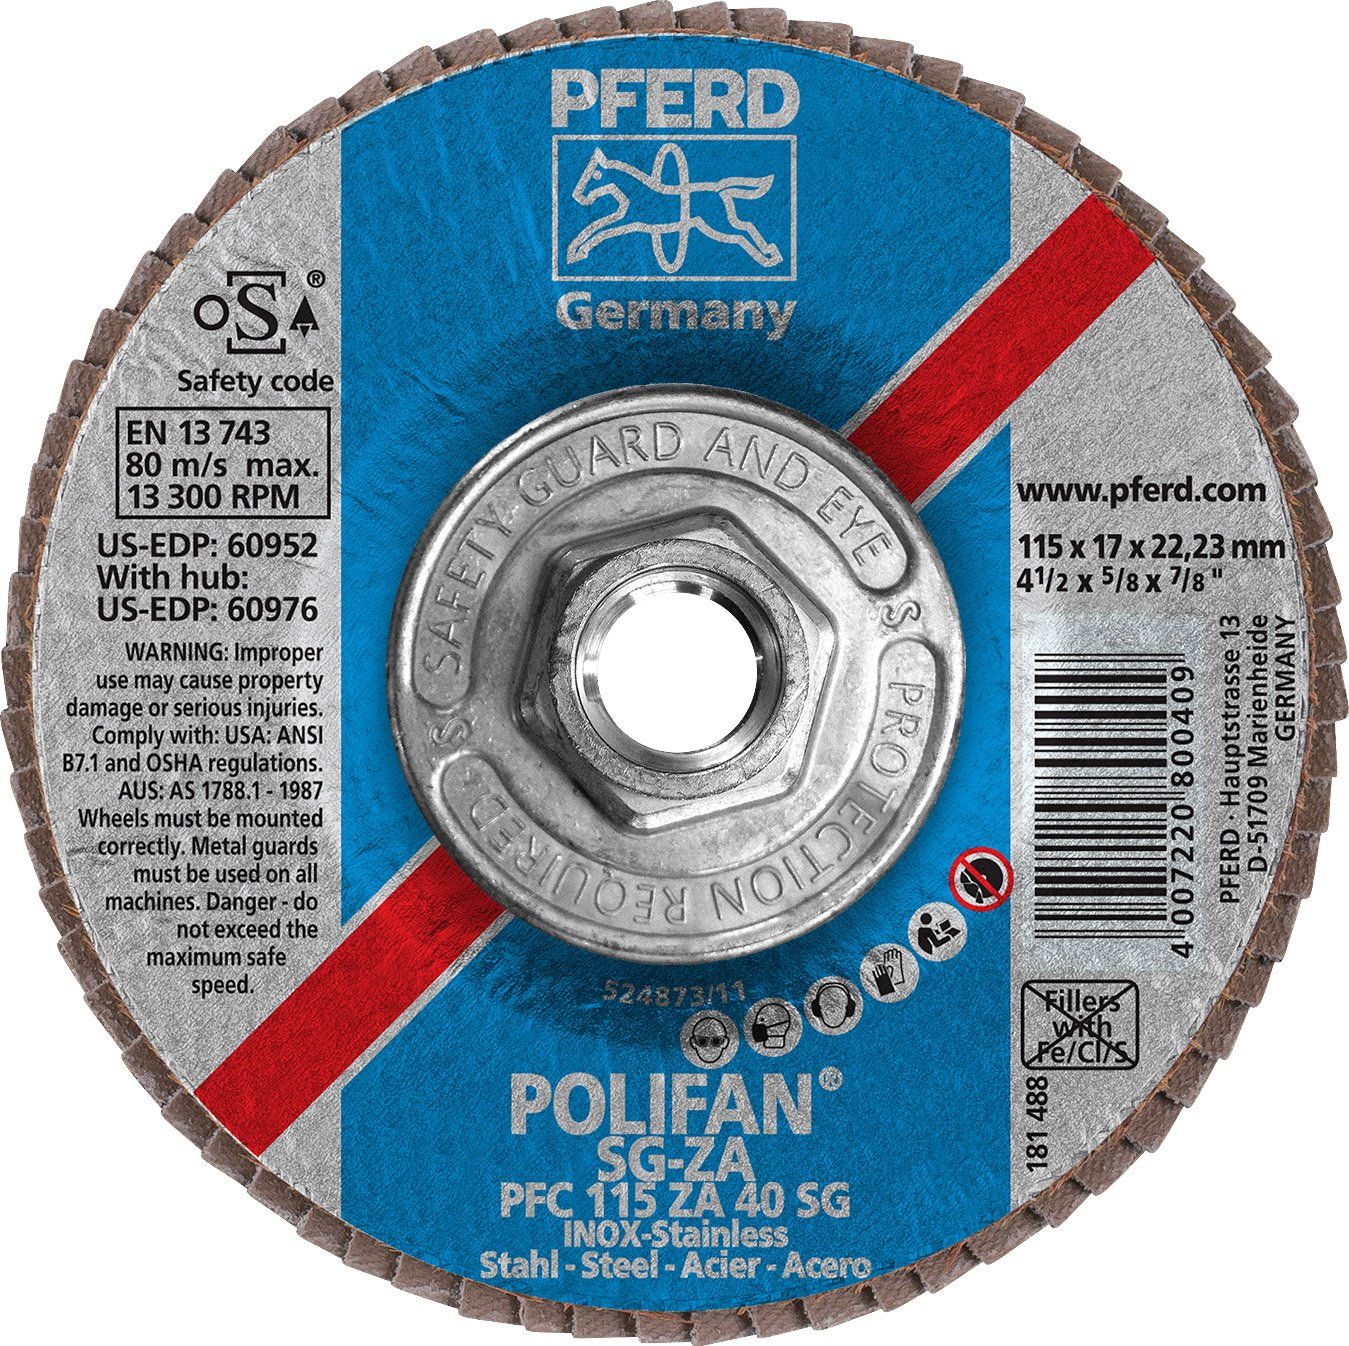 PFERD 60976 Polifan PFC Type 29 Conical Flap Disc, Zirconia Alumina/Aluminum Oxide, 4-1/2'' Diameter, 5/8-11 Thread, 13300 RPM, 40 Grit